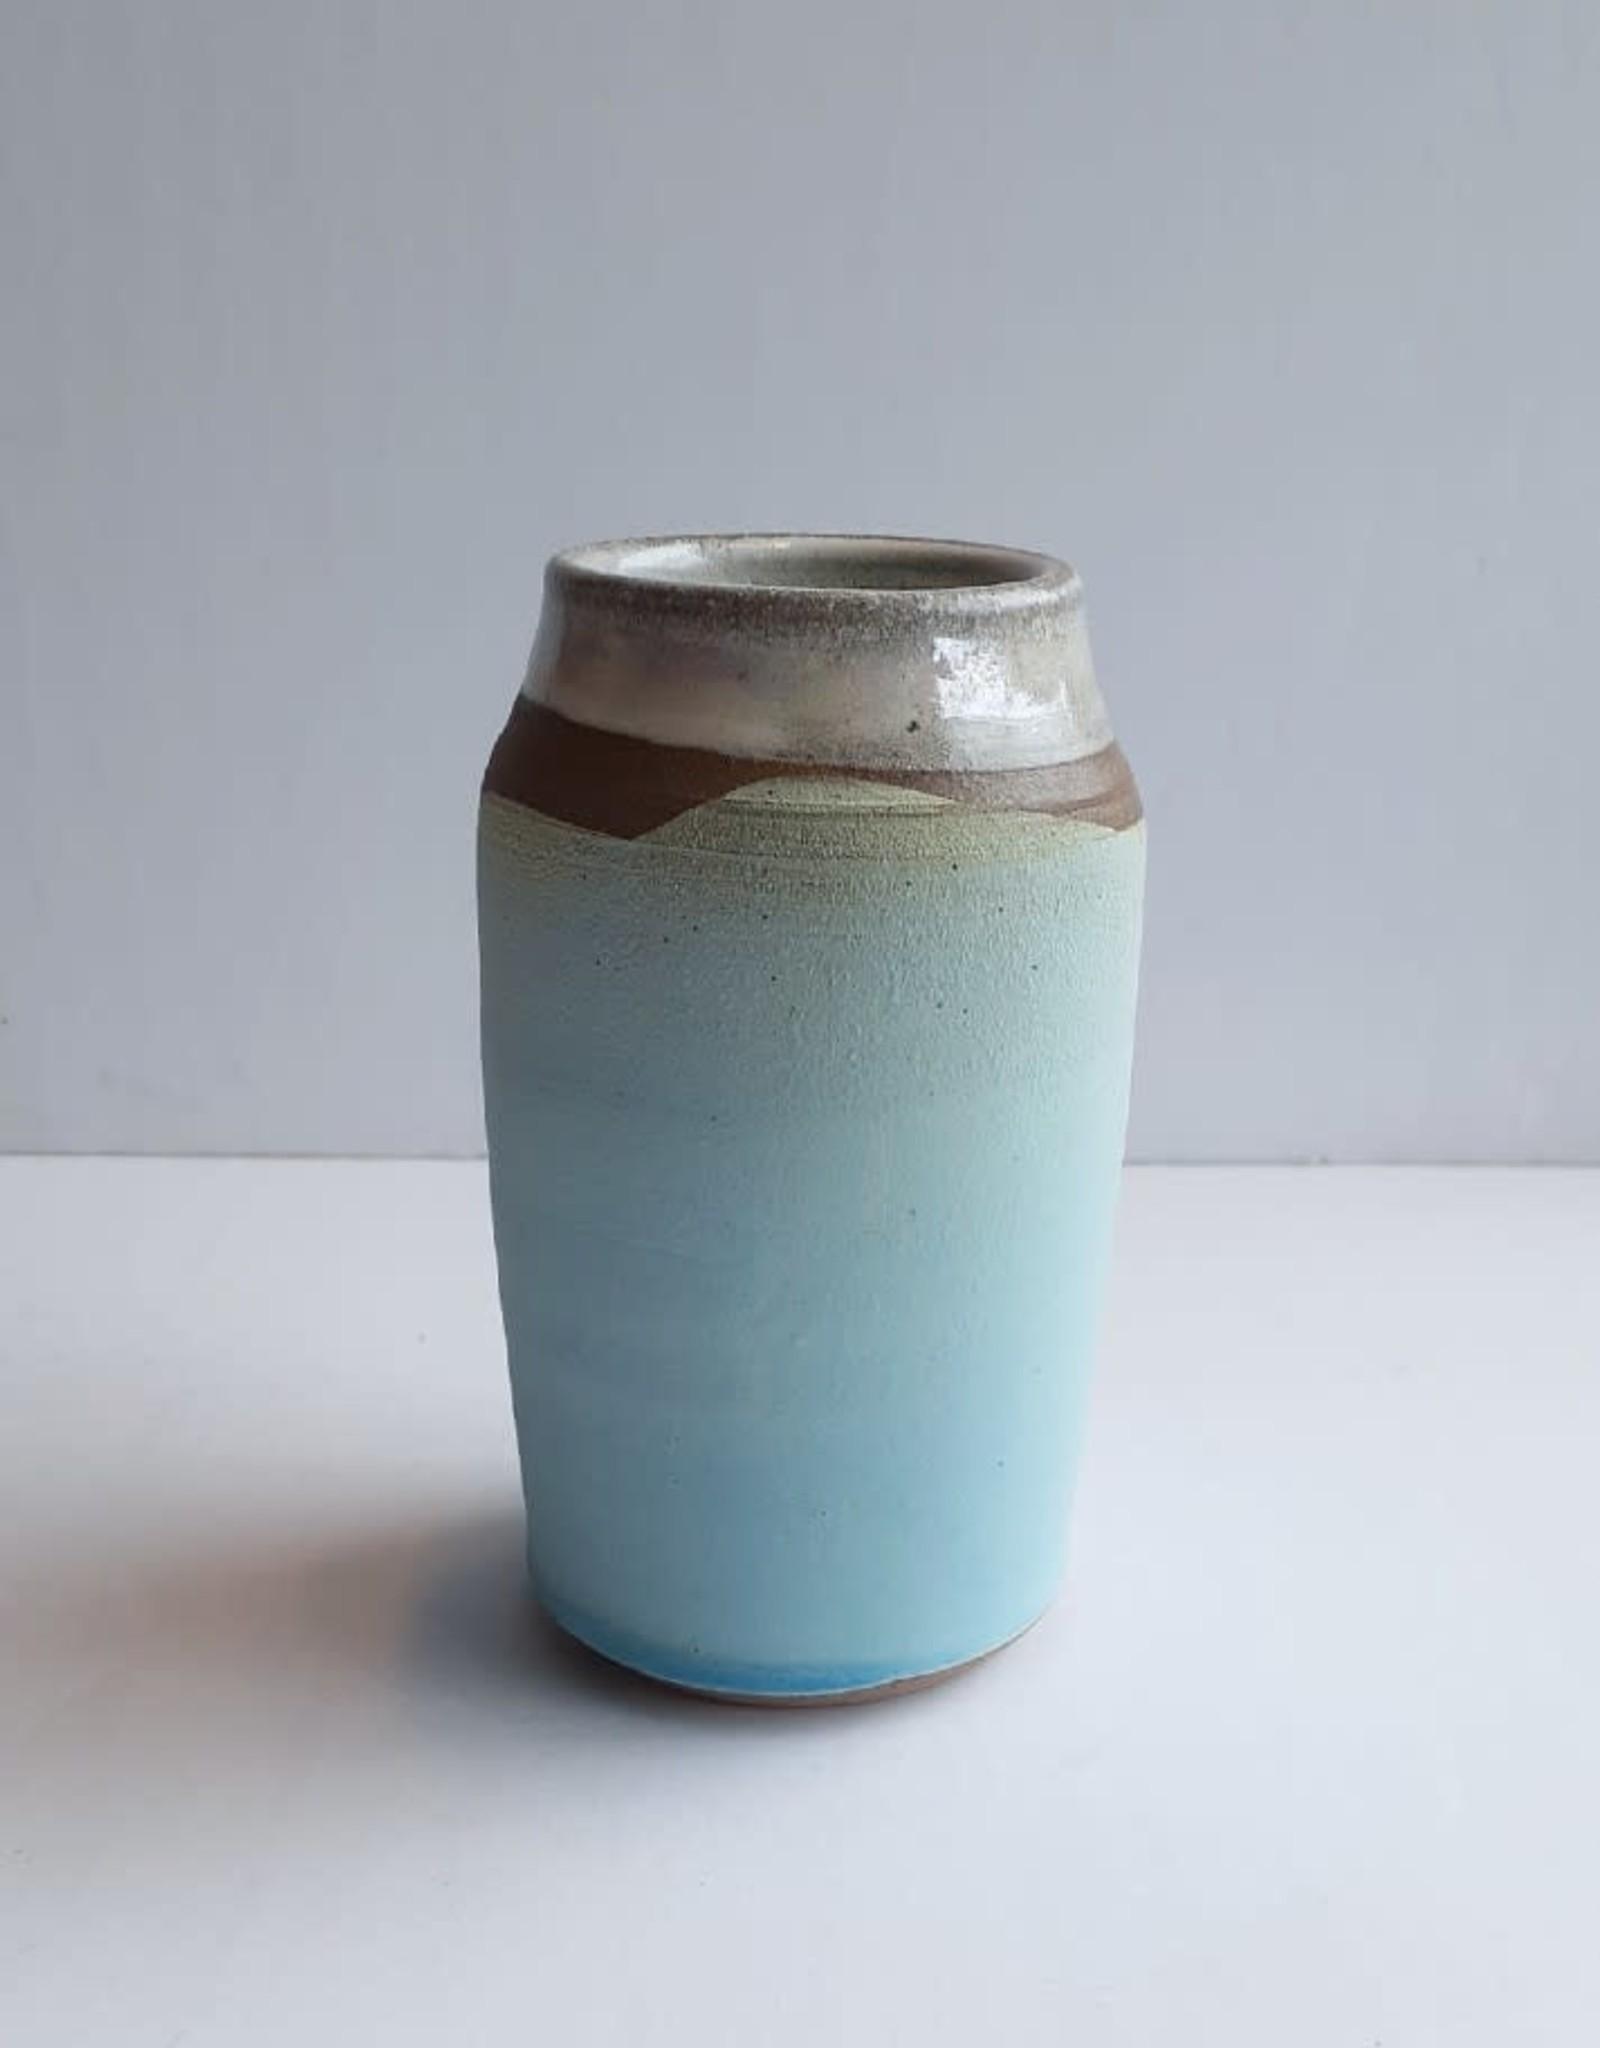 Jacinthe Brind'Amour Mini Vase 1 Jacinthe Brind'Amour